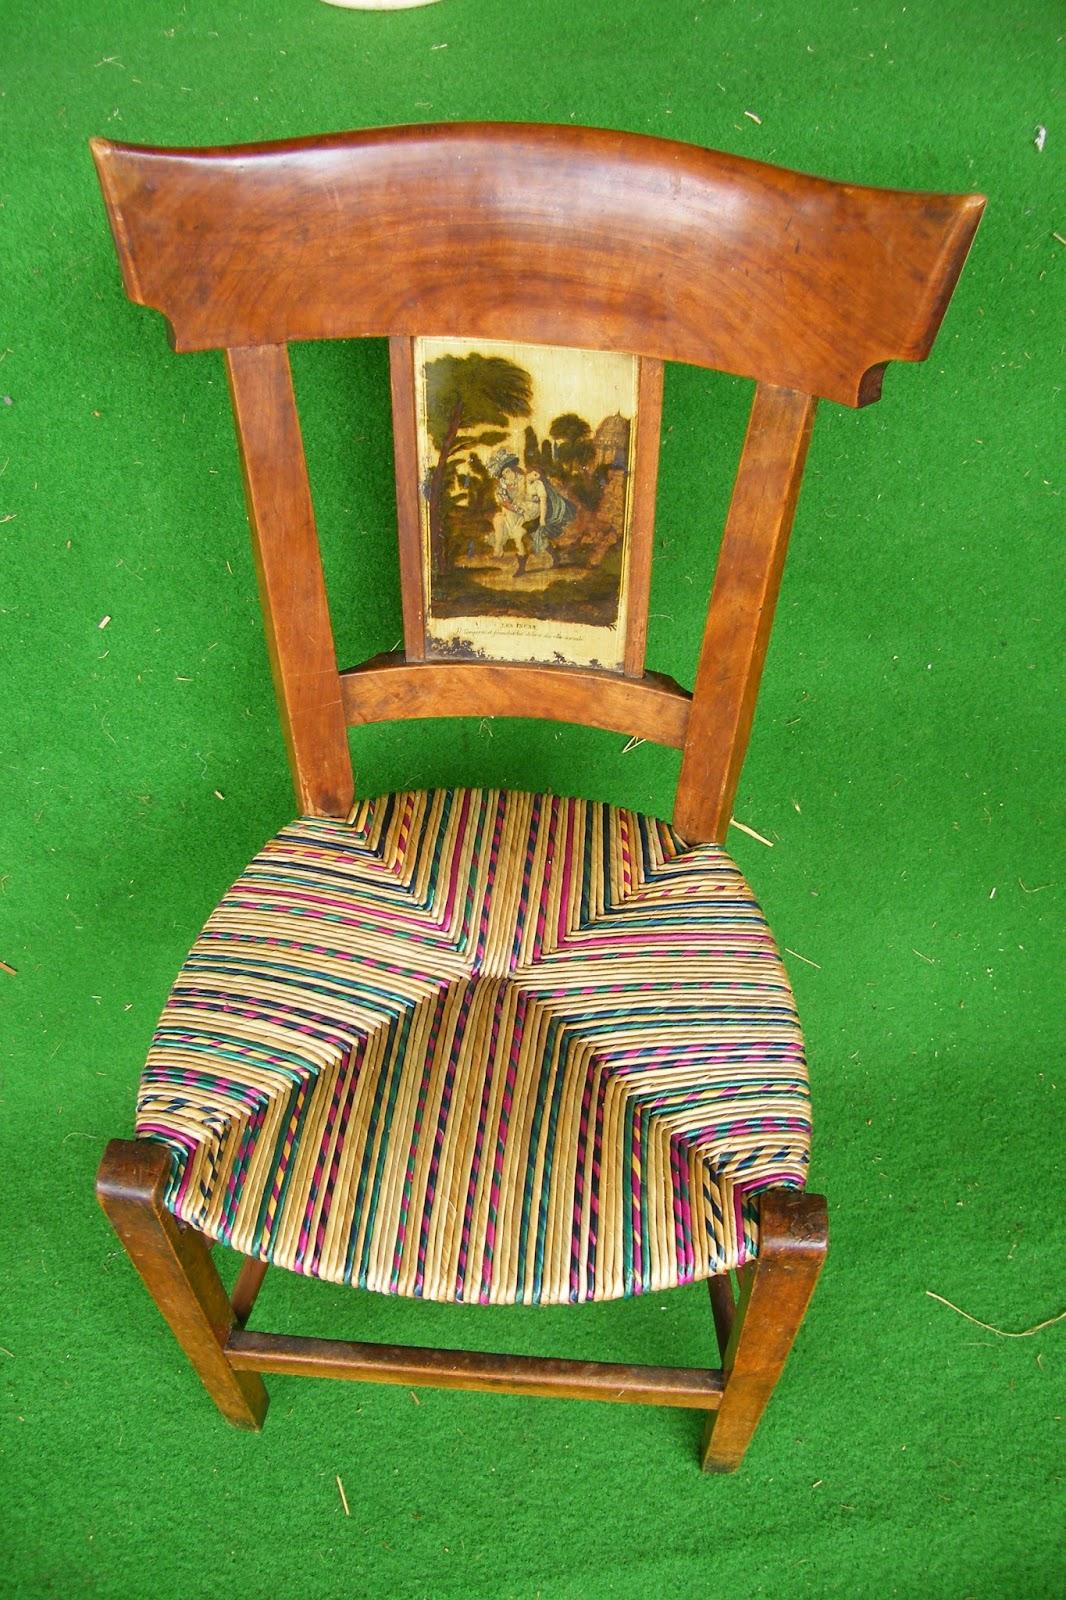 normandie cannage les fauteuils et chaises directoire informations g n rales. Black Bedroom Furniture Sets. Home Design Ideas